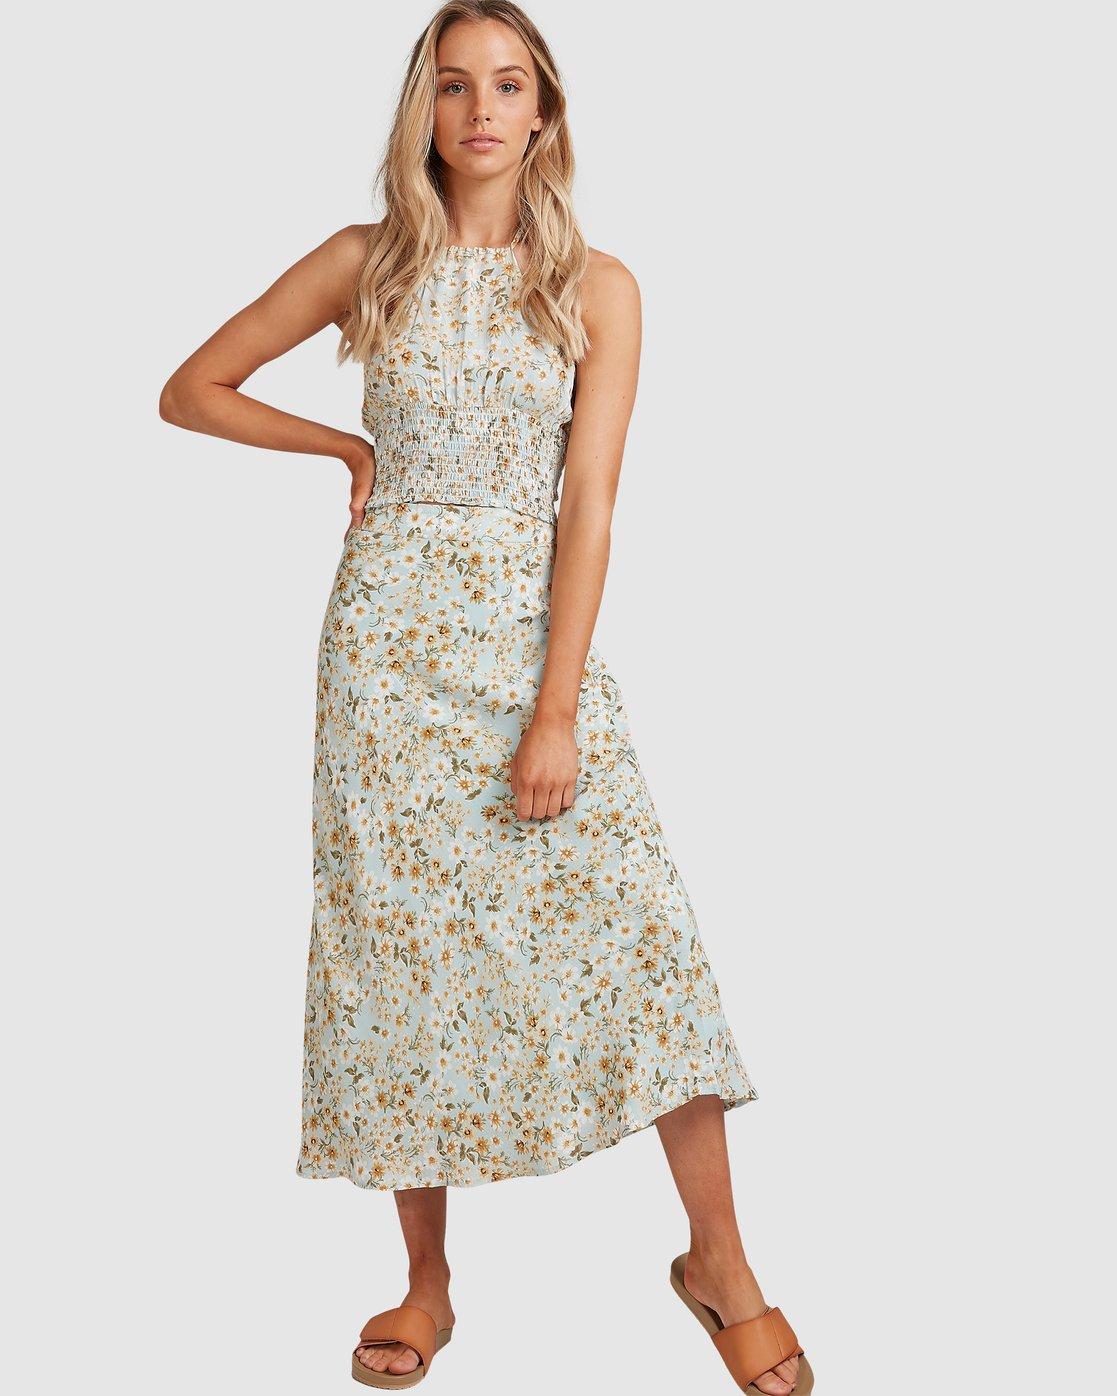 Del Mar Midi Skirt